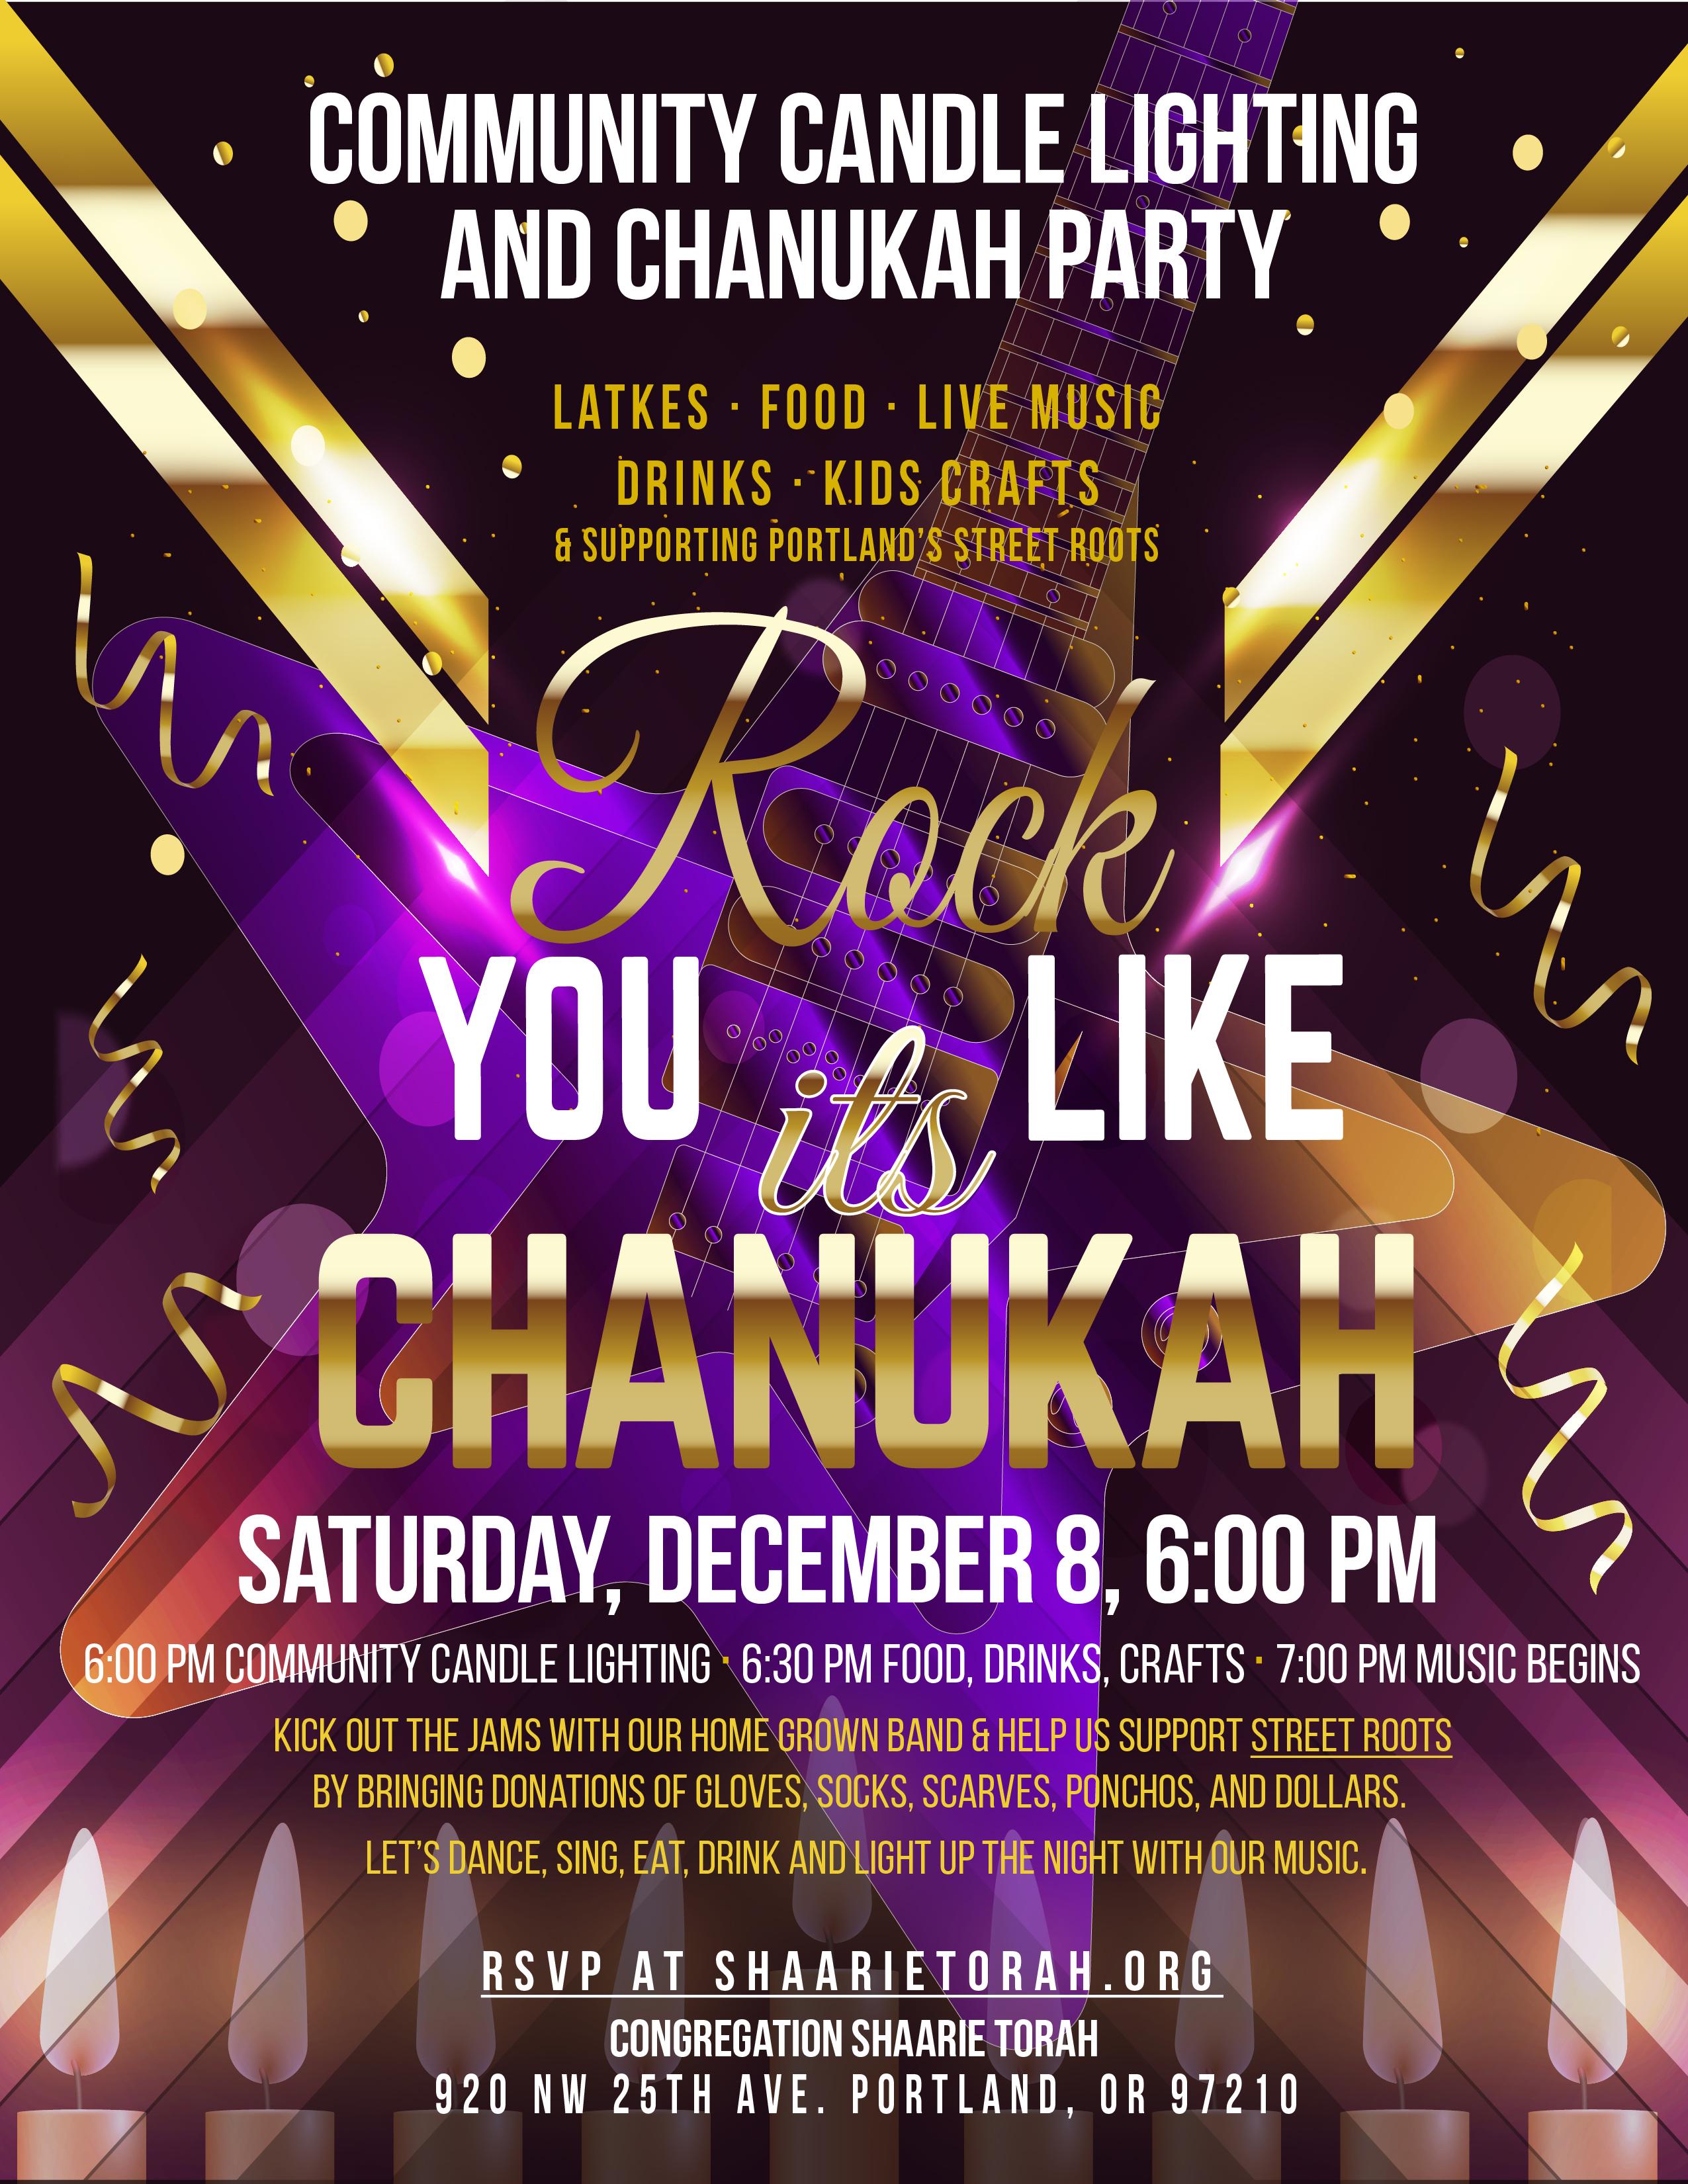 Chanukah Party Shaarie Torah Public Candle Lighting